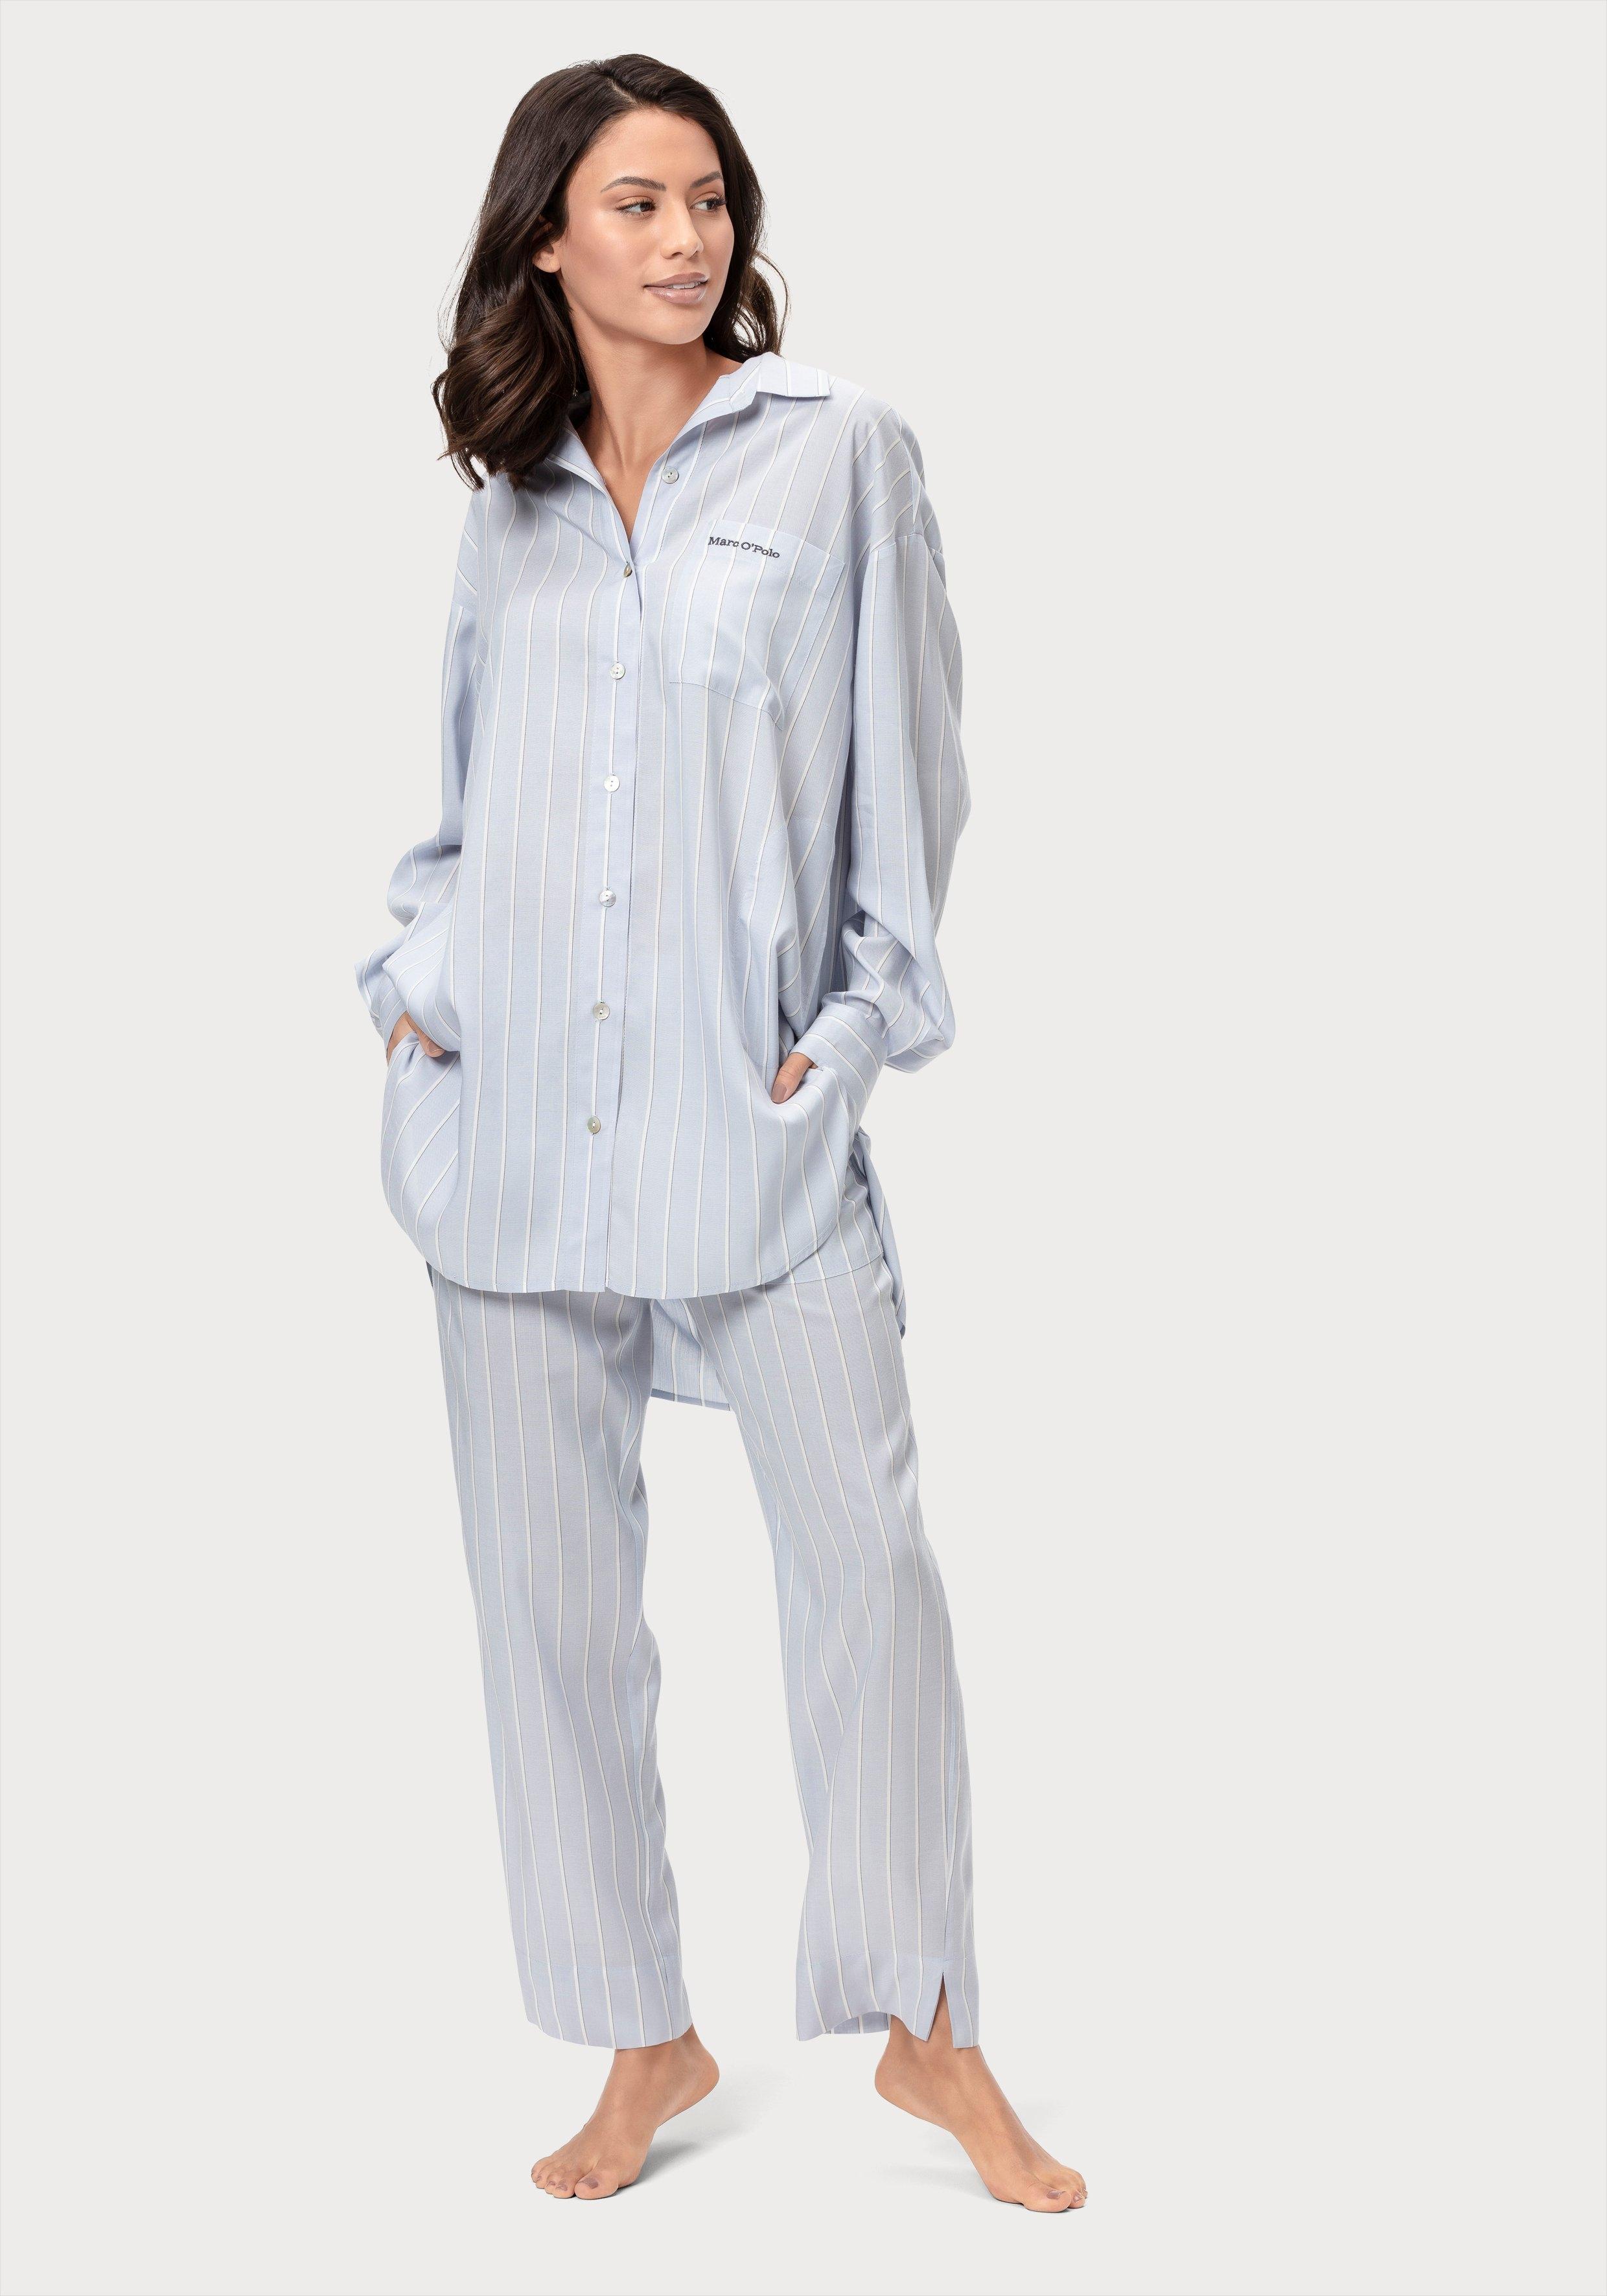 Marc O'Polo pyjamabroek nu online kopen bij Lascana